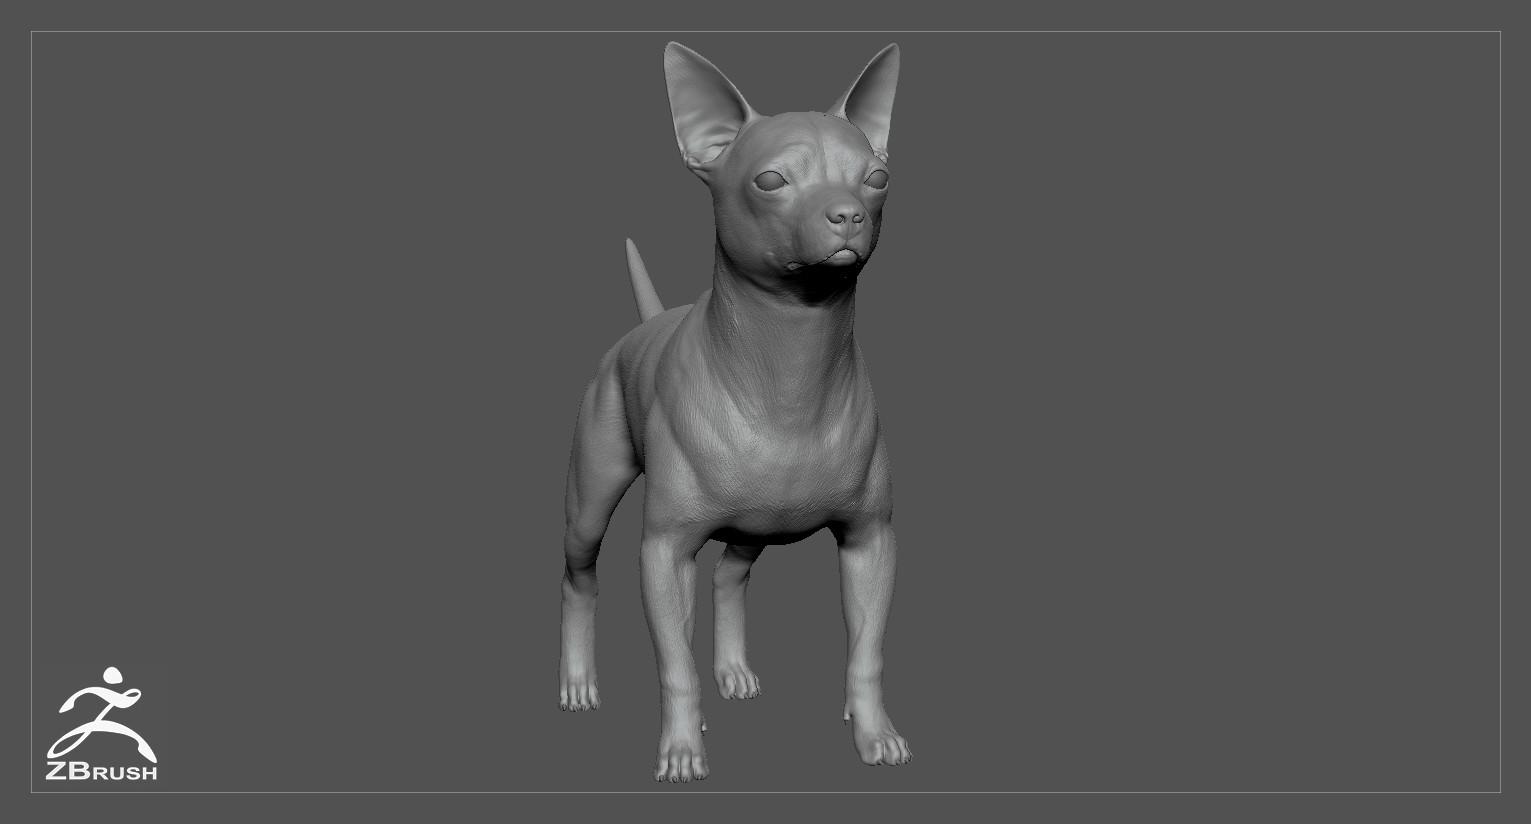 Chihuahua by alexlashko zbrush 02